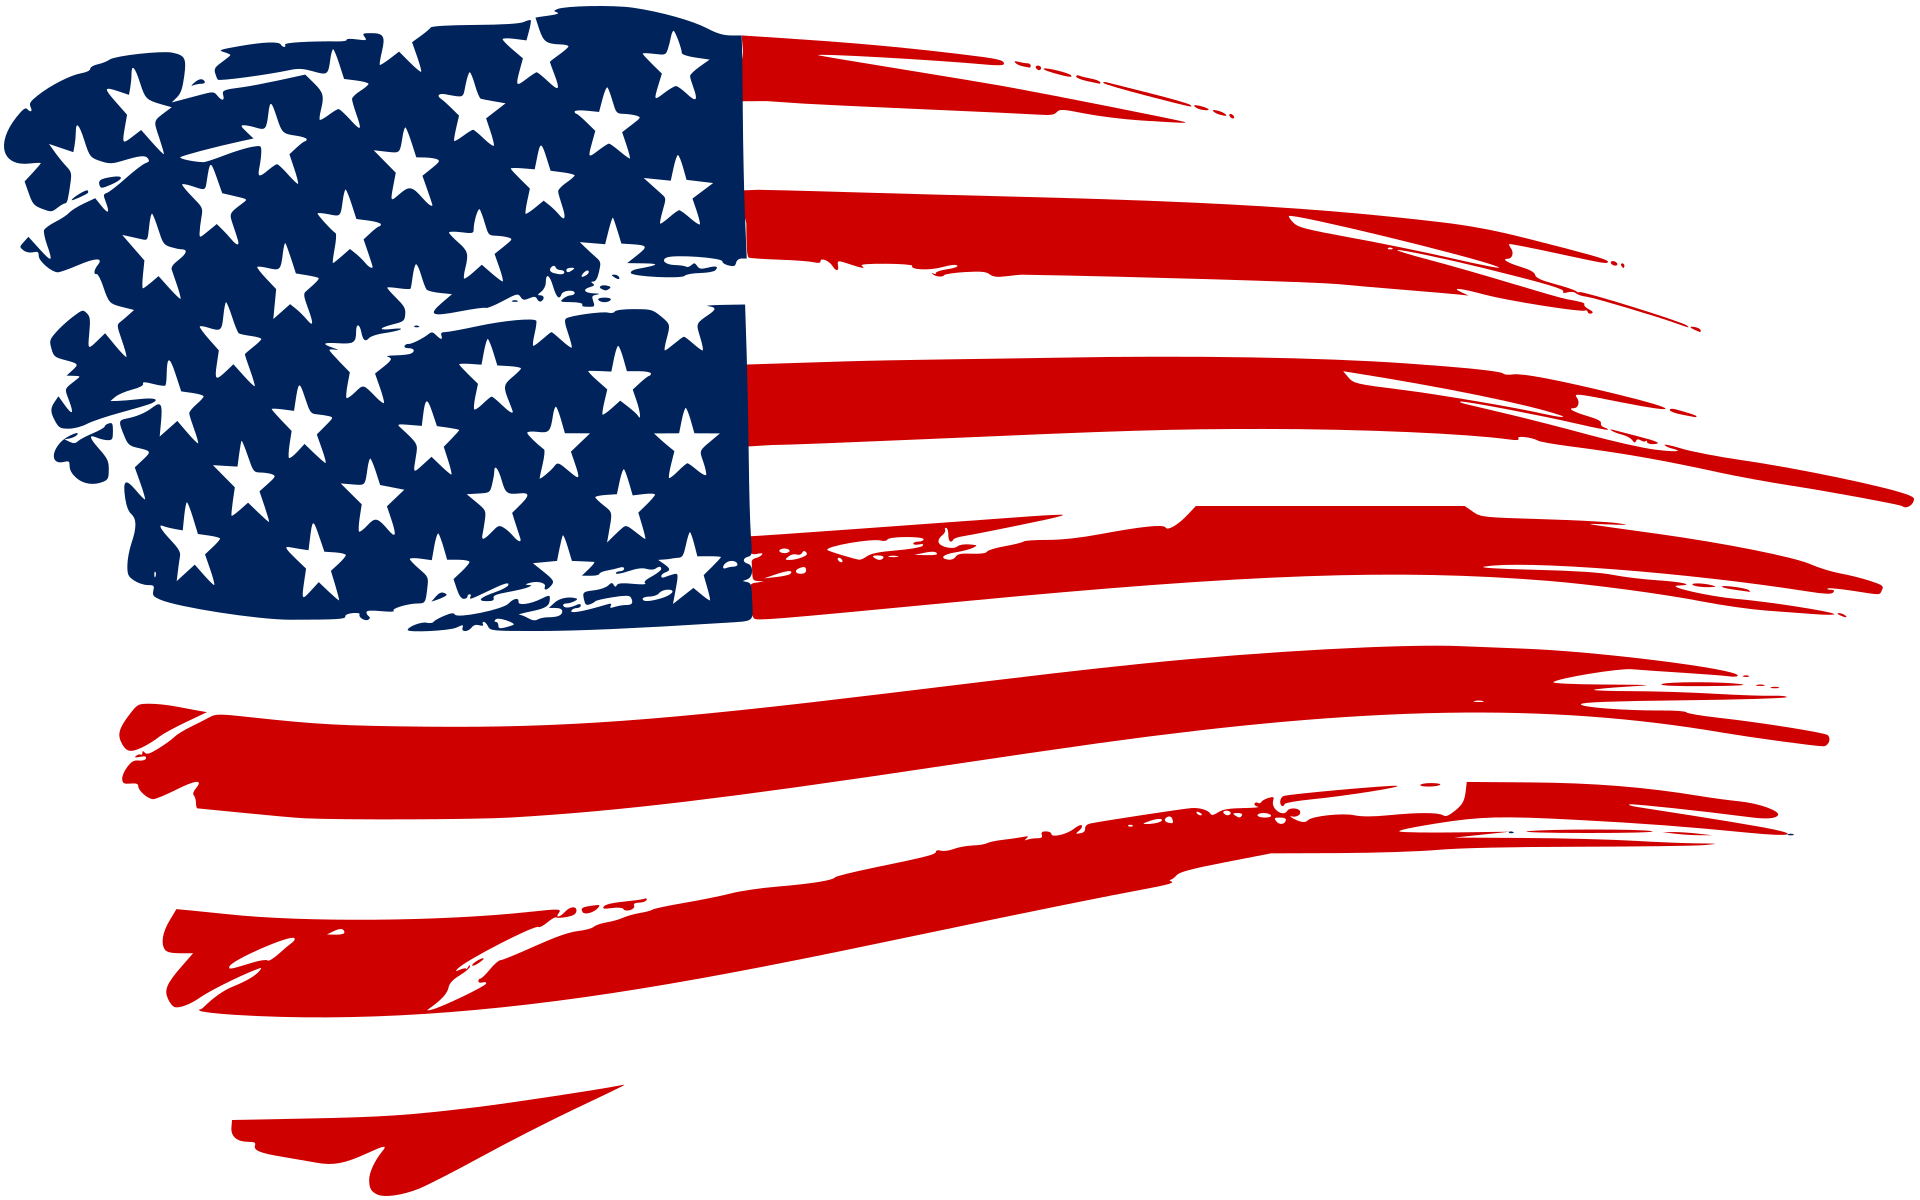 American flag flaming.